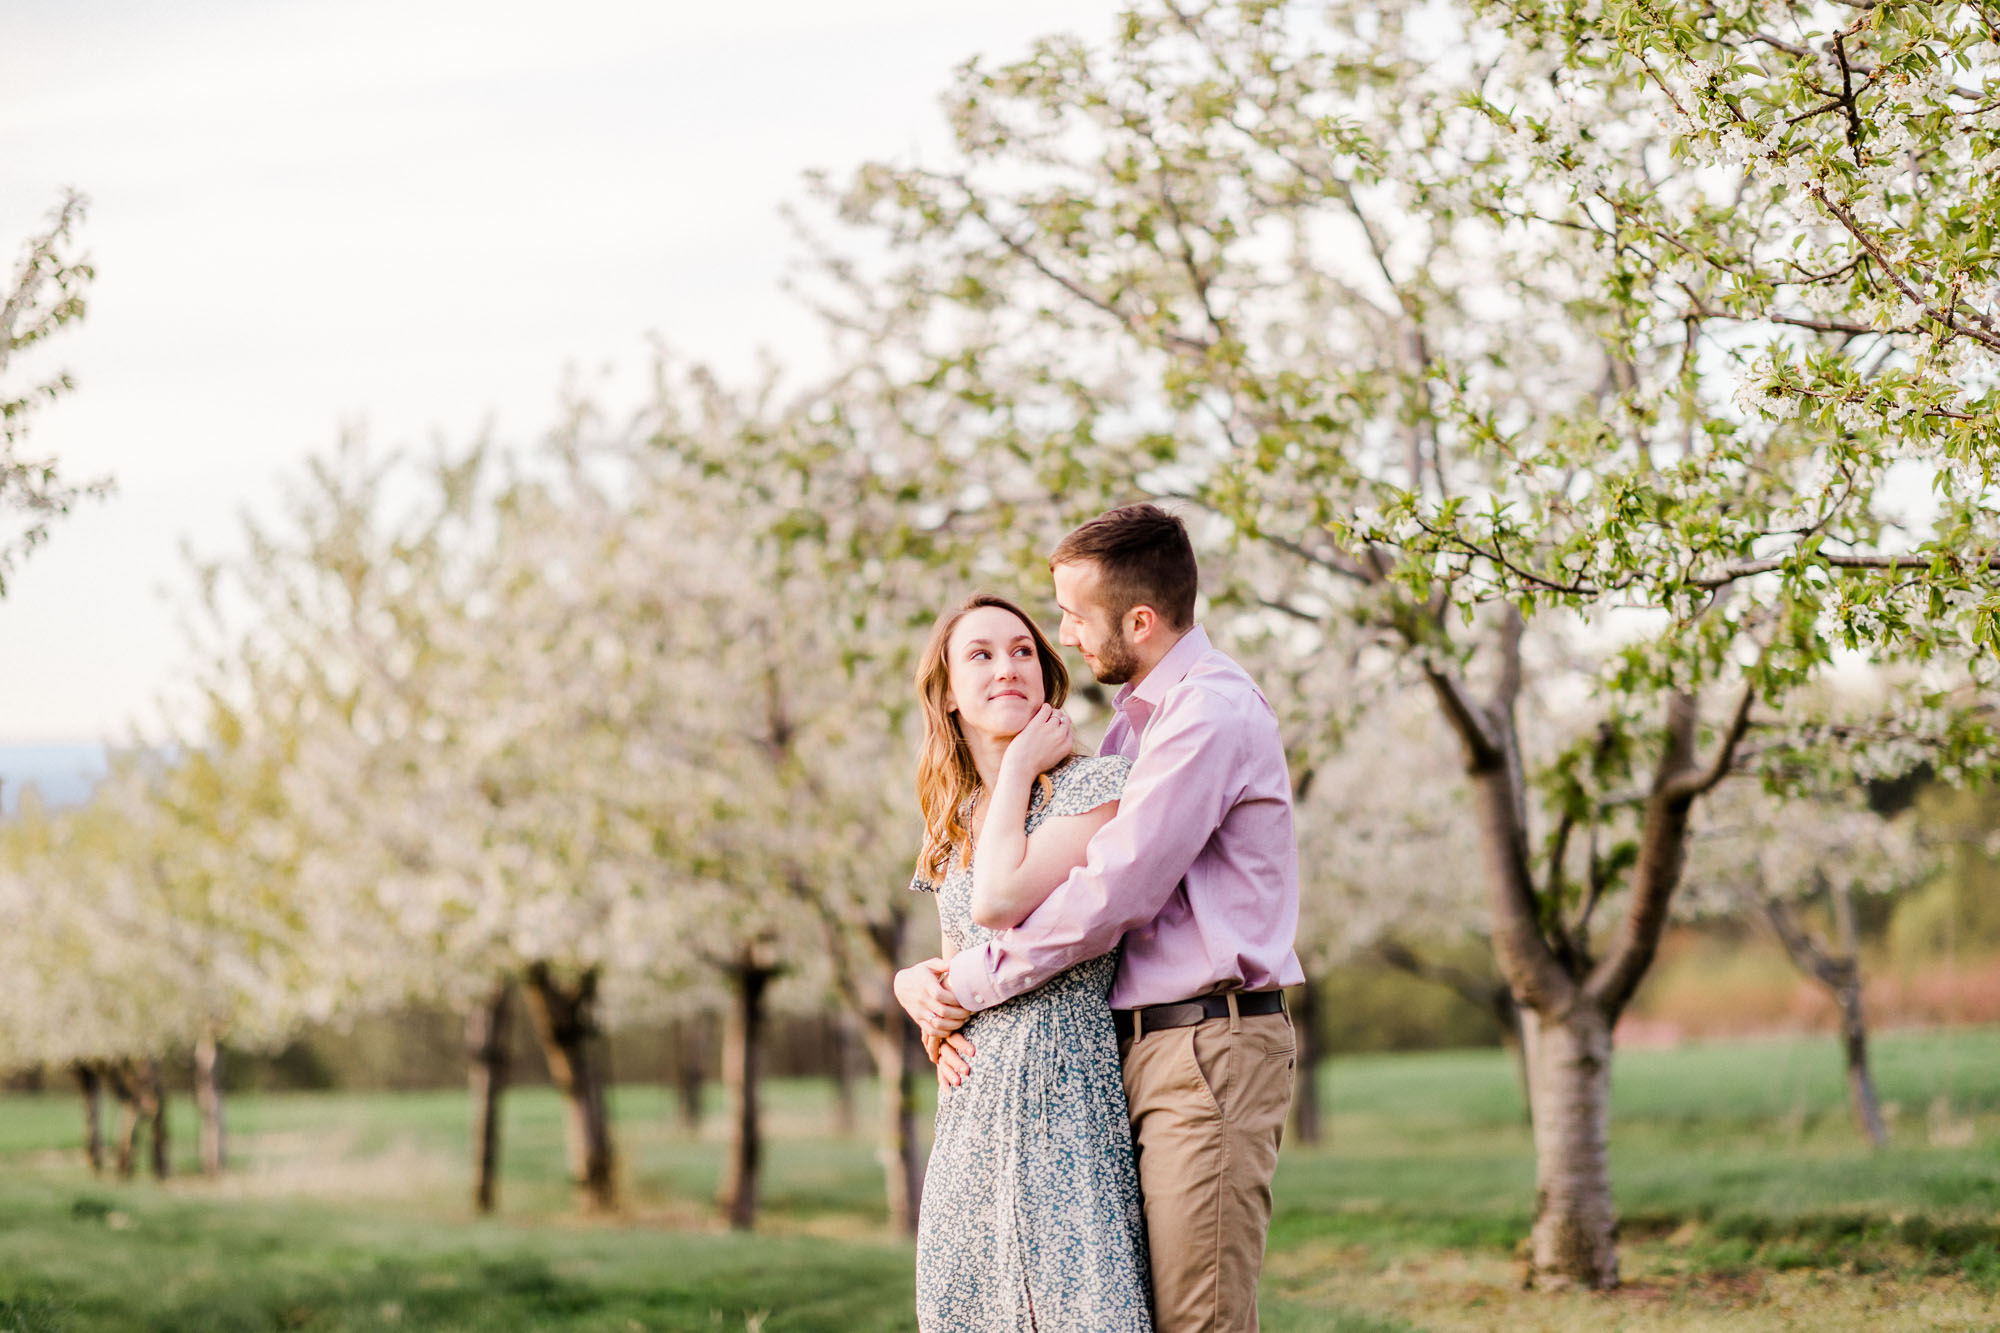 Rohrbachs-Spring-cherry-blossom-engagement-7705.jpg